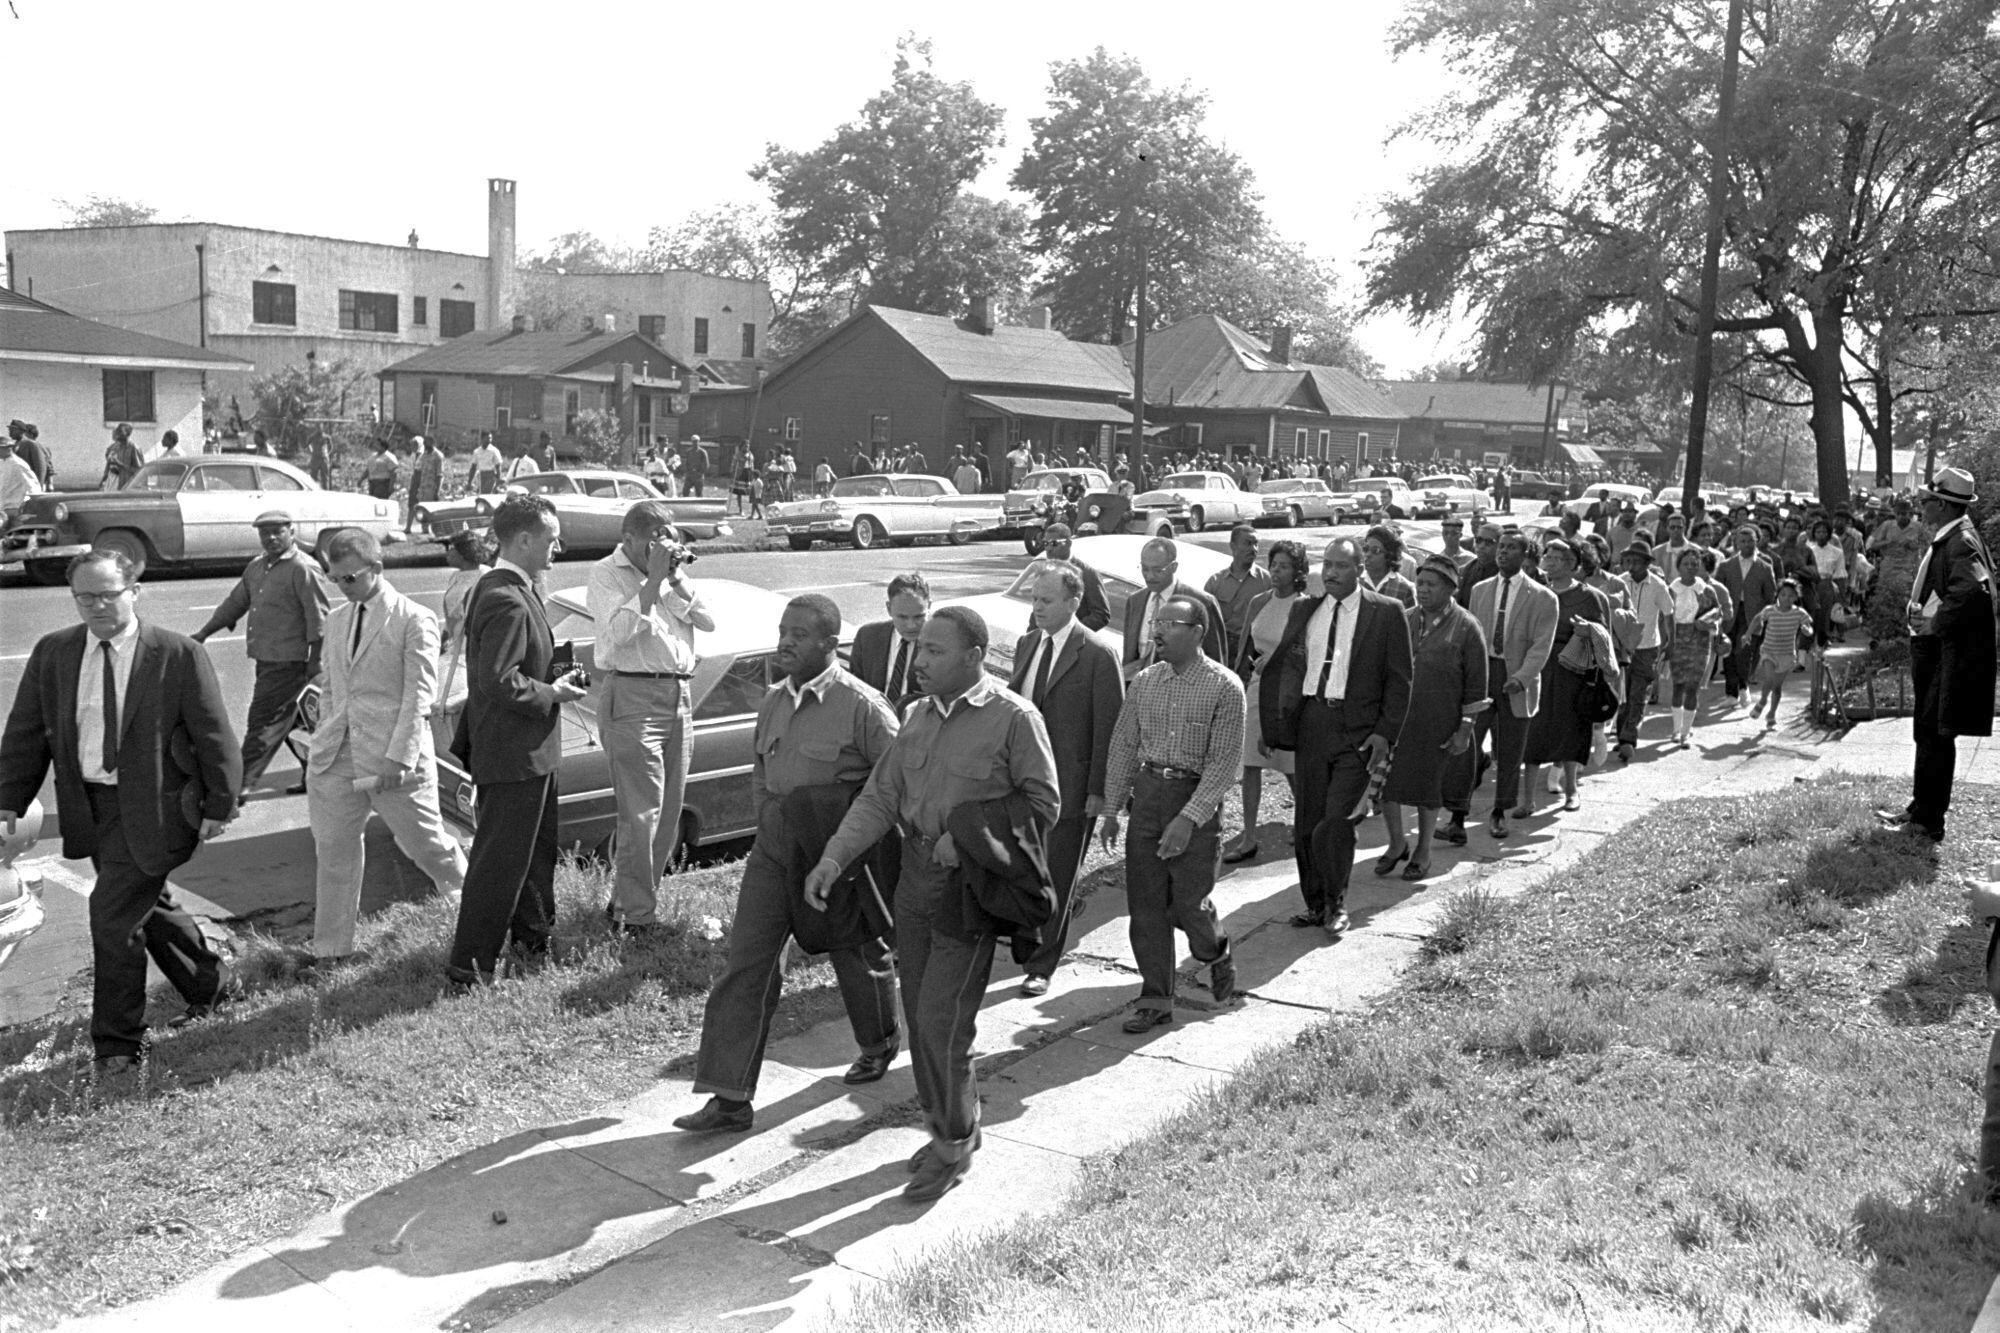 Jonathan McPherson, Martin Luther King Jr., Ralph Abernathy, Birmingham march